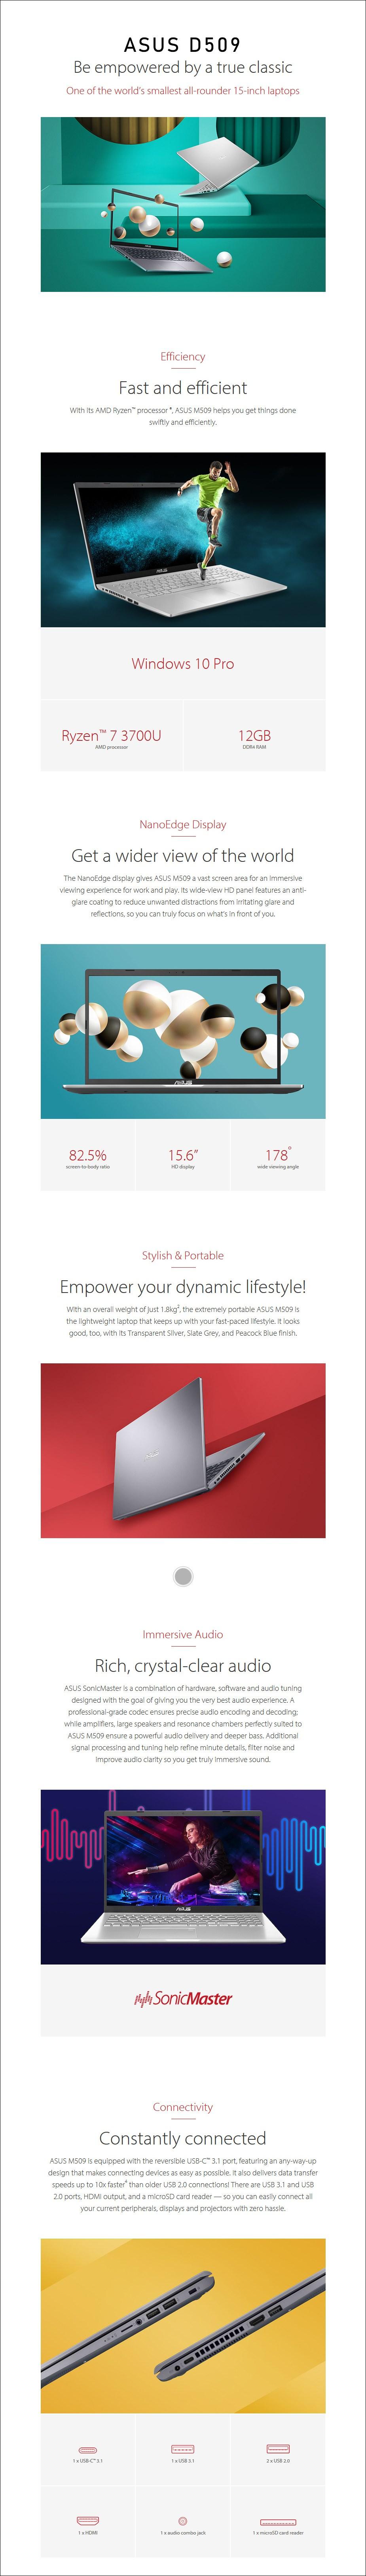 "ASUS D509DA-EJ355R 15.6"" Laptop R7-3700U 12GB 512GB W10P - Slate Grey - Overview 1"